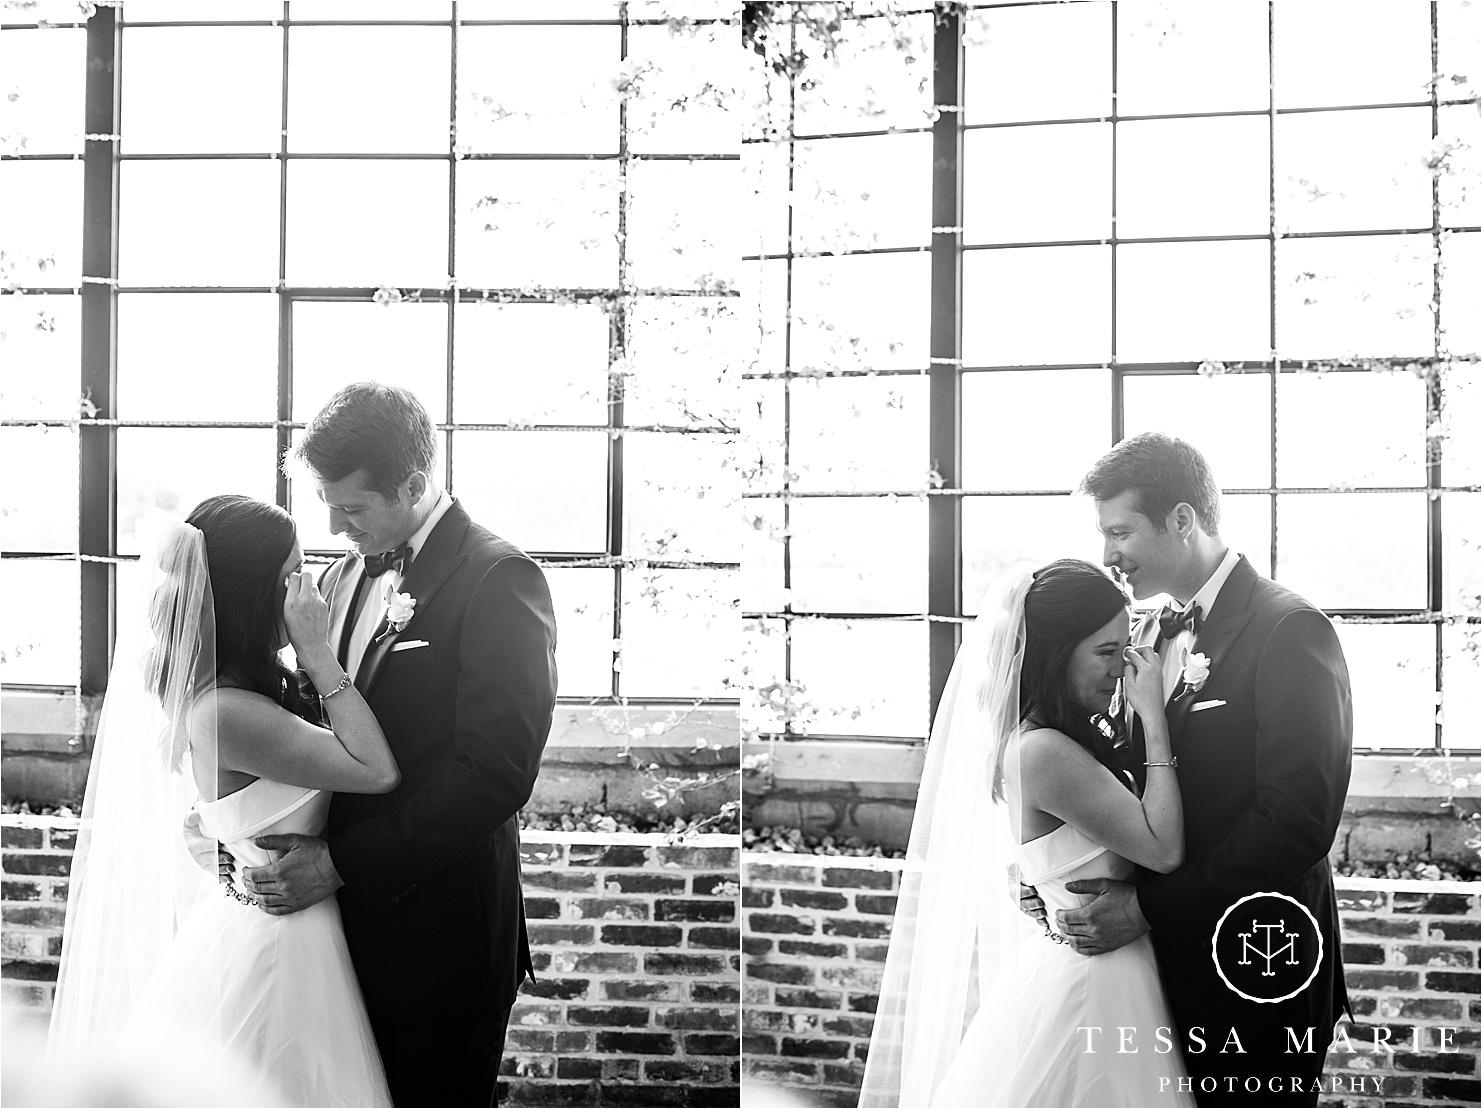 Tessa_marie_weddings_houston_wedding_photographer_The_astorian_0050.jpg